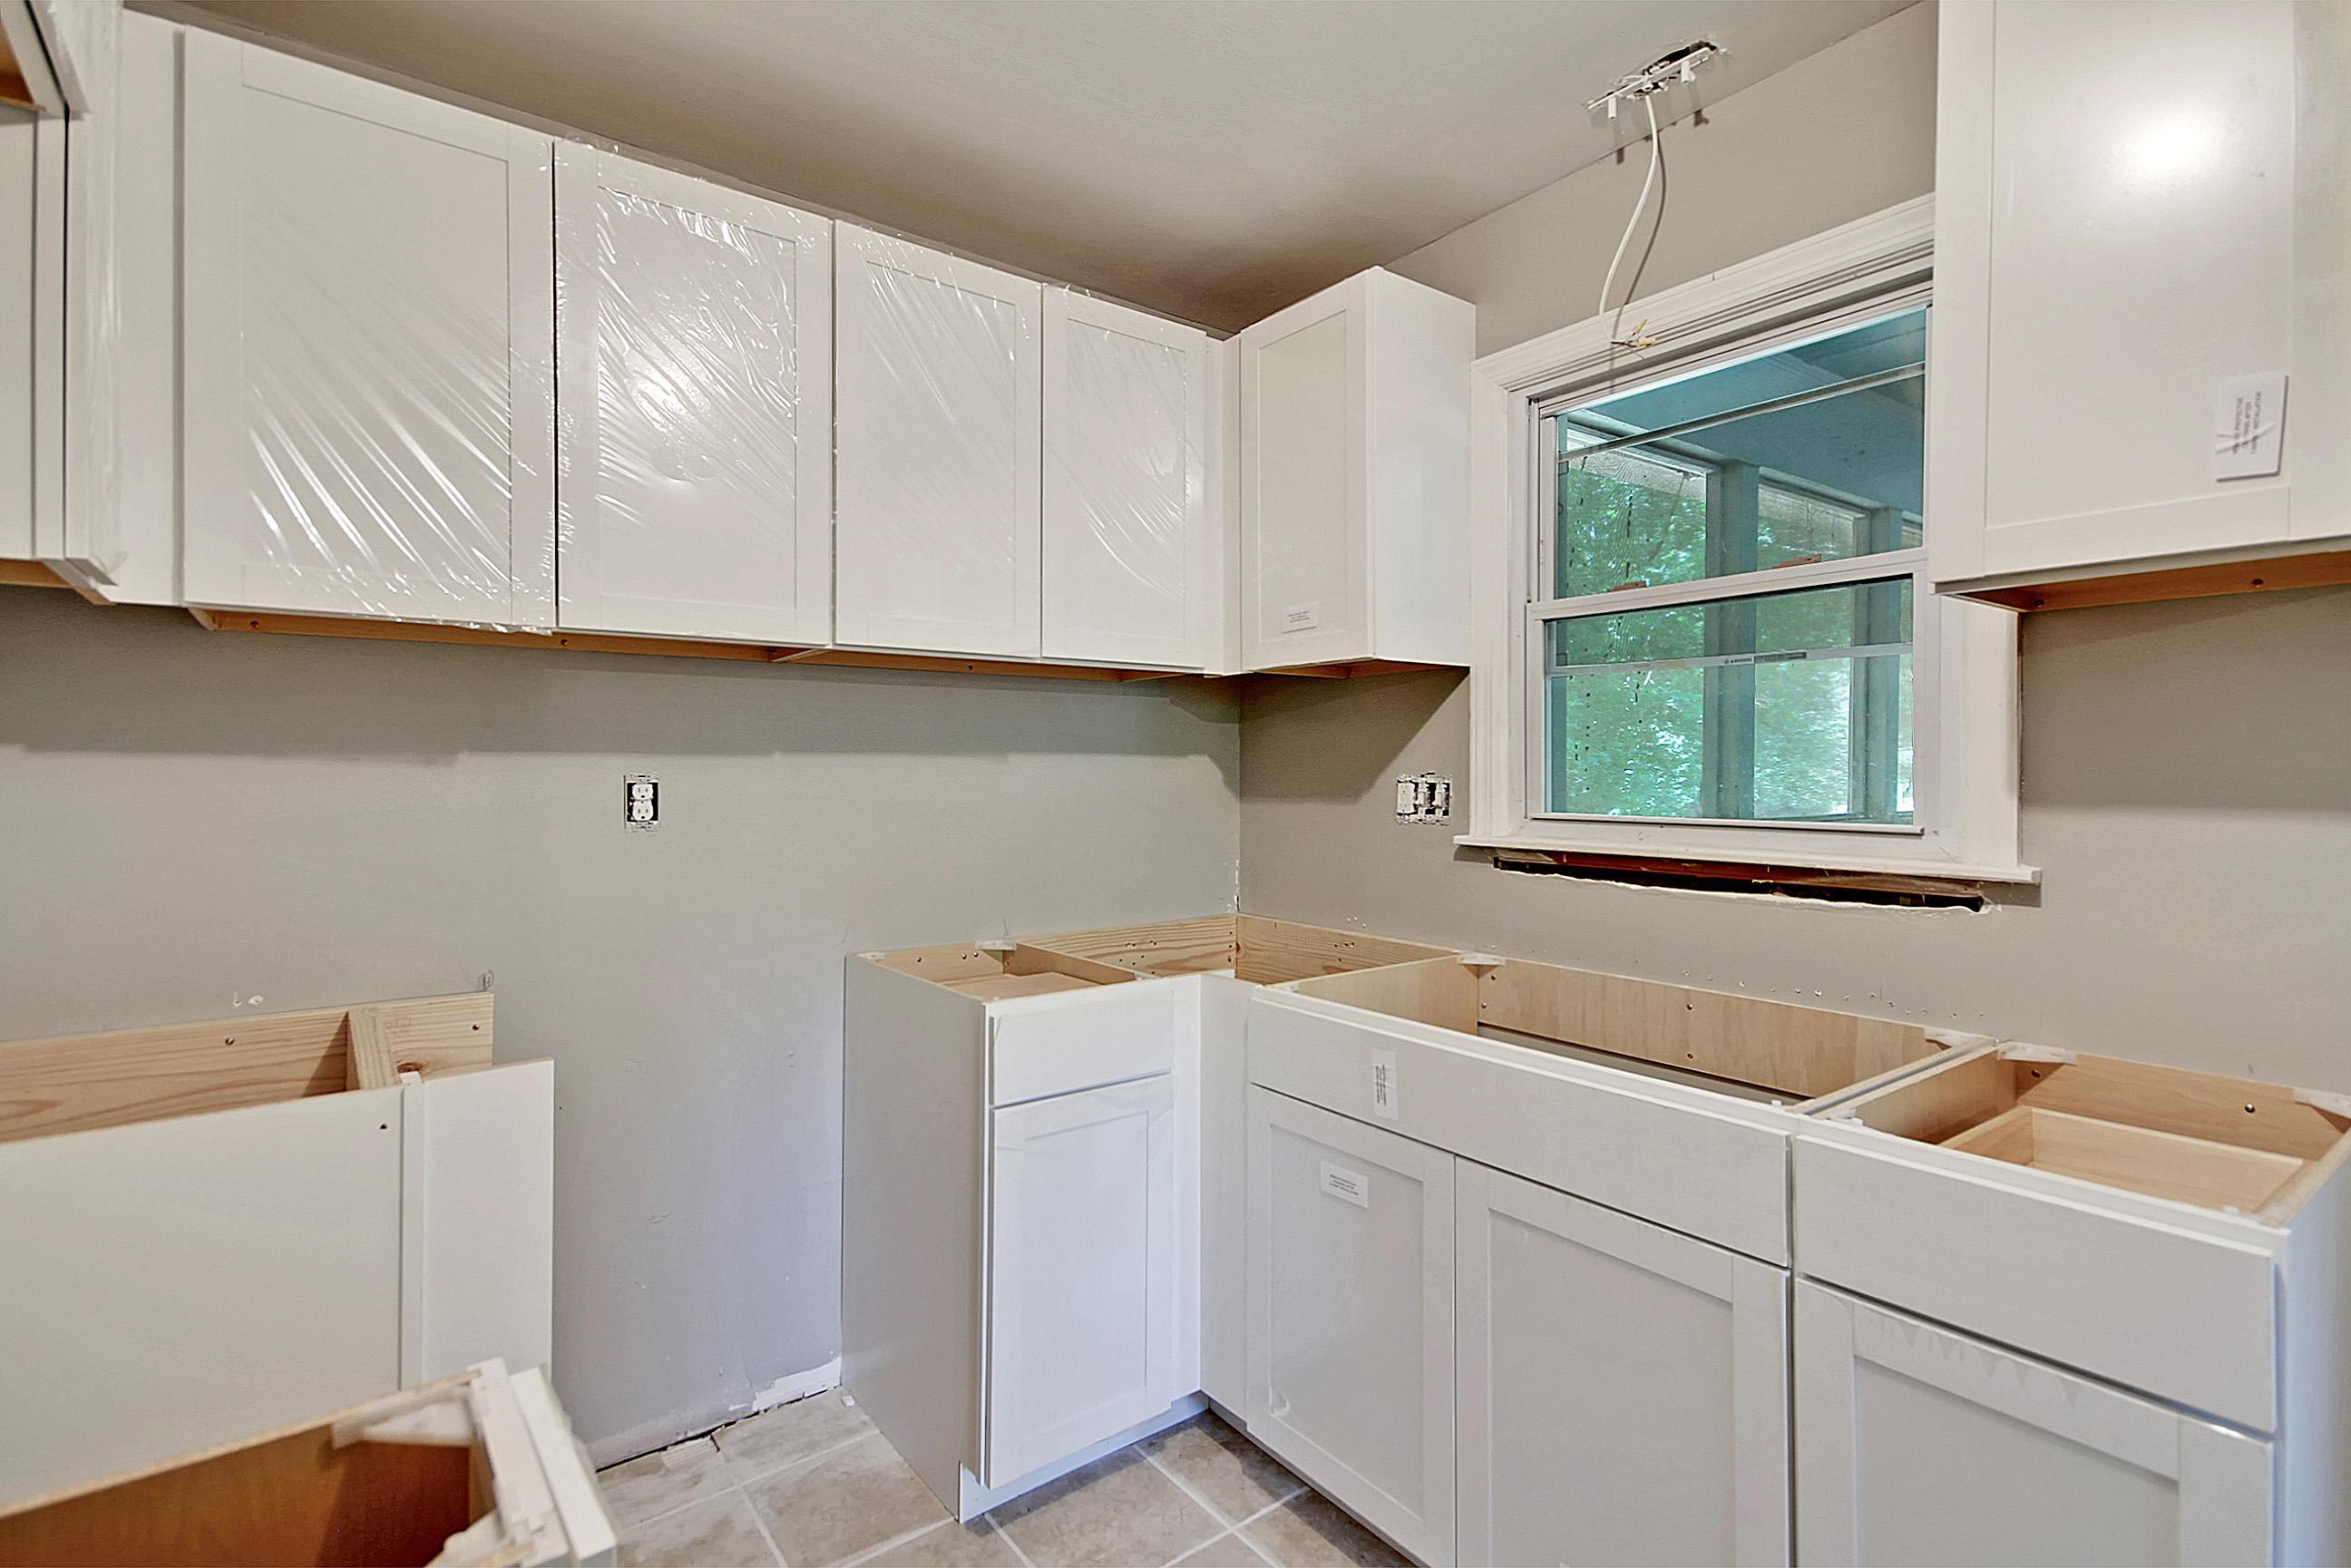 Northbridge Terrace Homes For Sale - 1094 Northbridge, Charleston, SC - 9